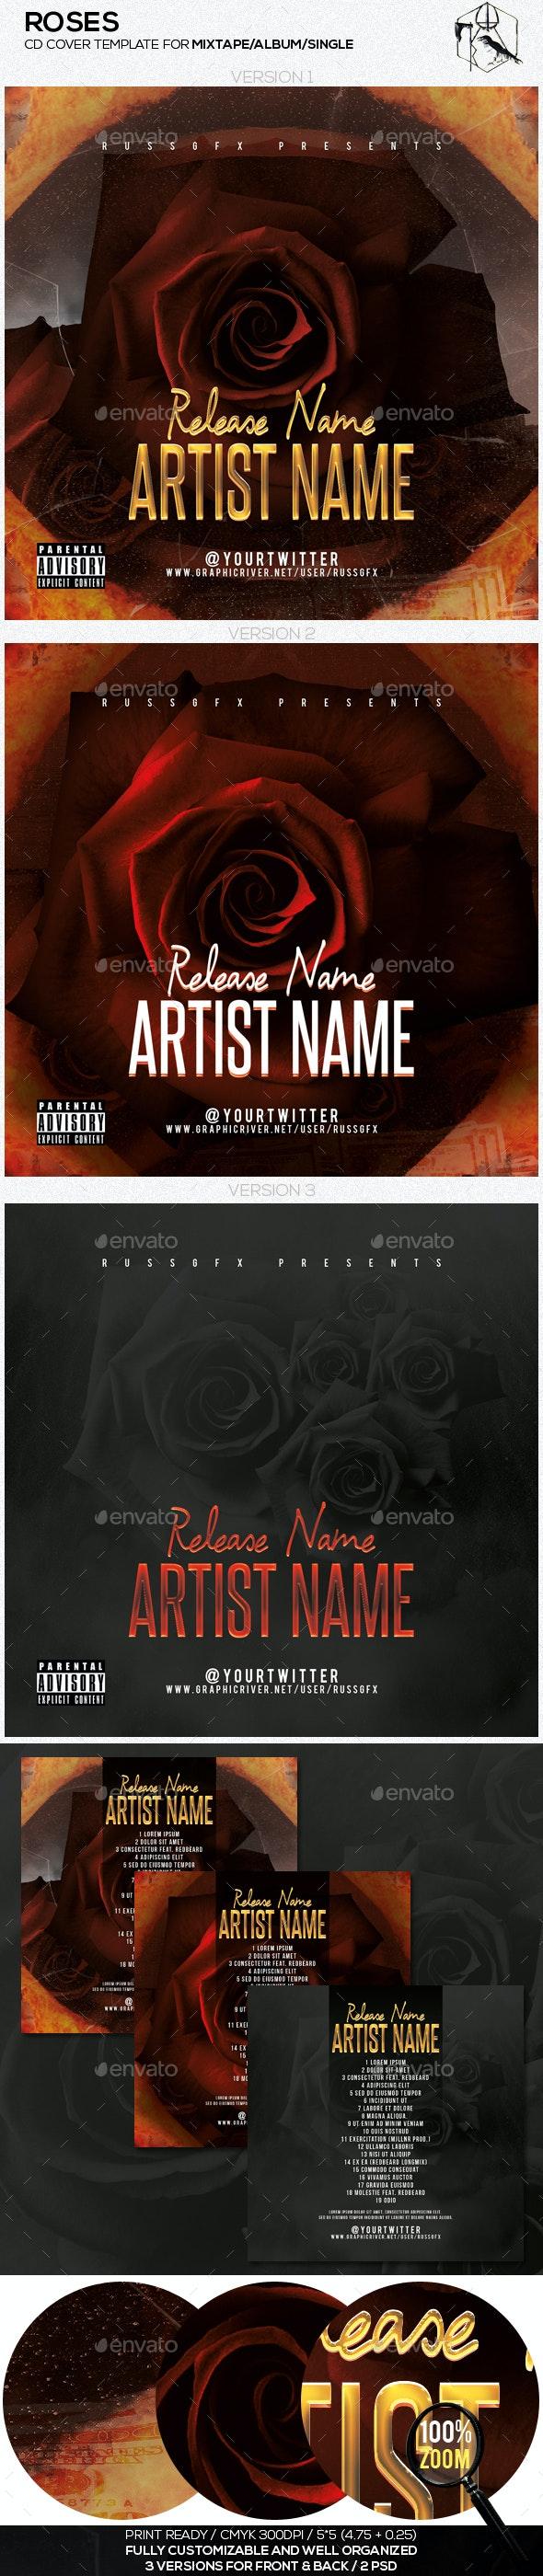 Roses PSD CD Mixtape Cover Template - CD & DVD Artwork Print Templates